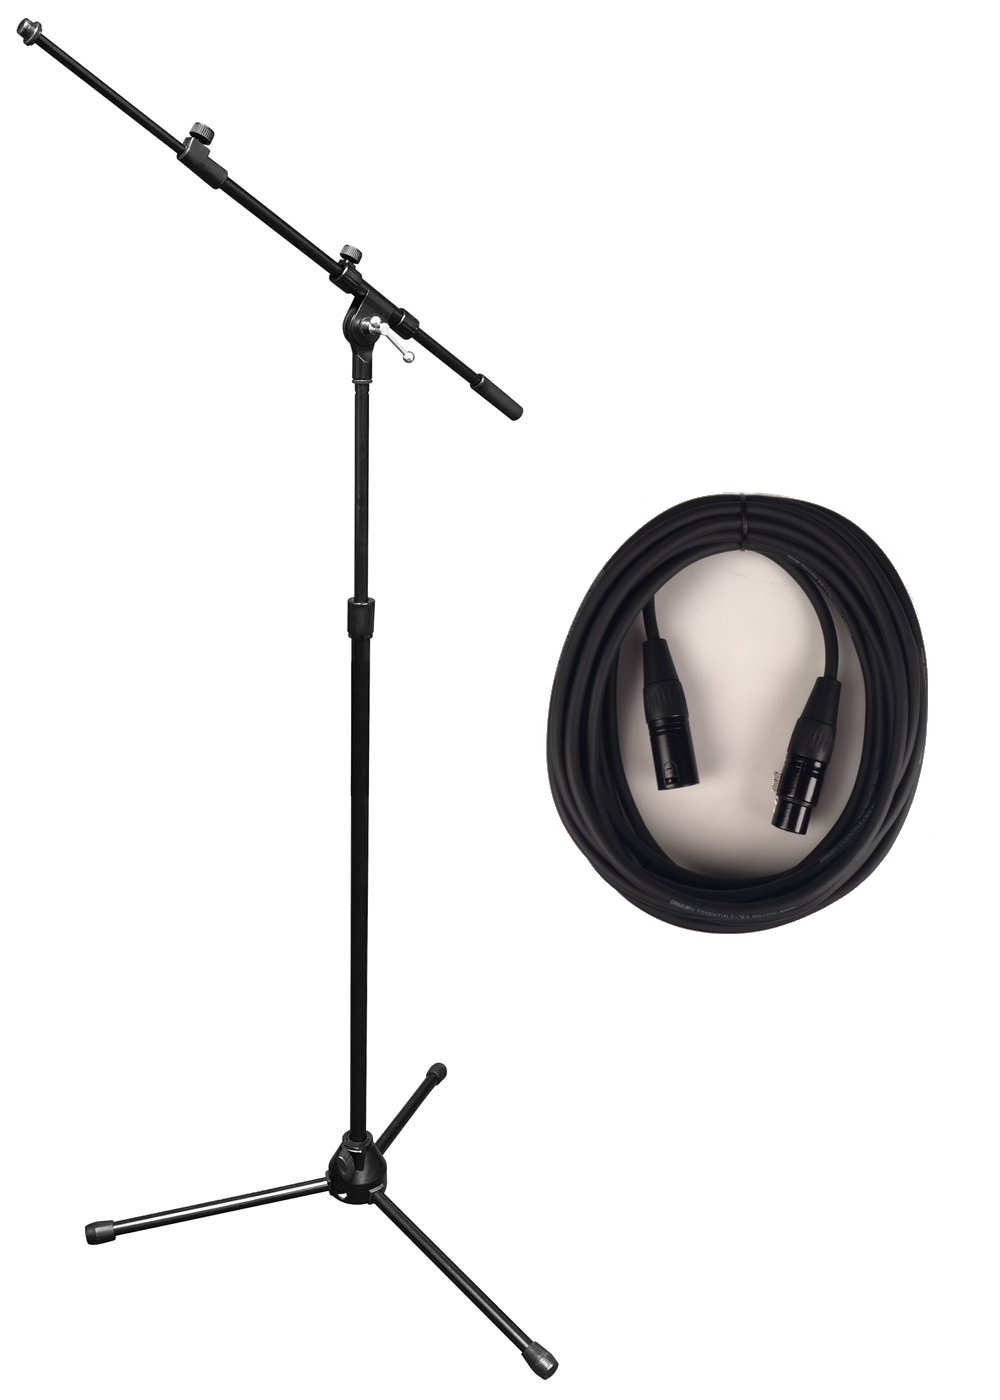 Vu MST100 Bundle MST100-30B Tripod Microphone Stand with (1) MIC-20 XLR Microphone Cable MST100-PK1-K